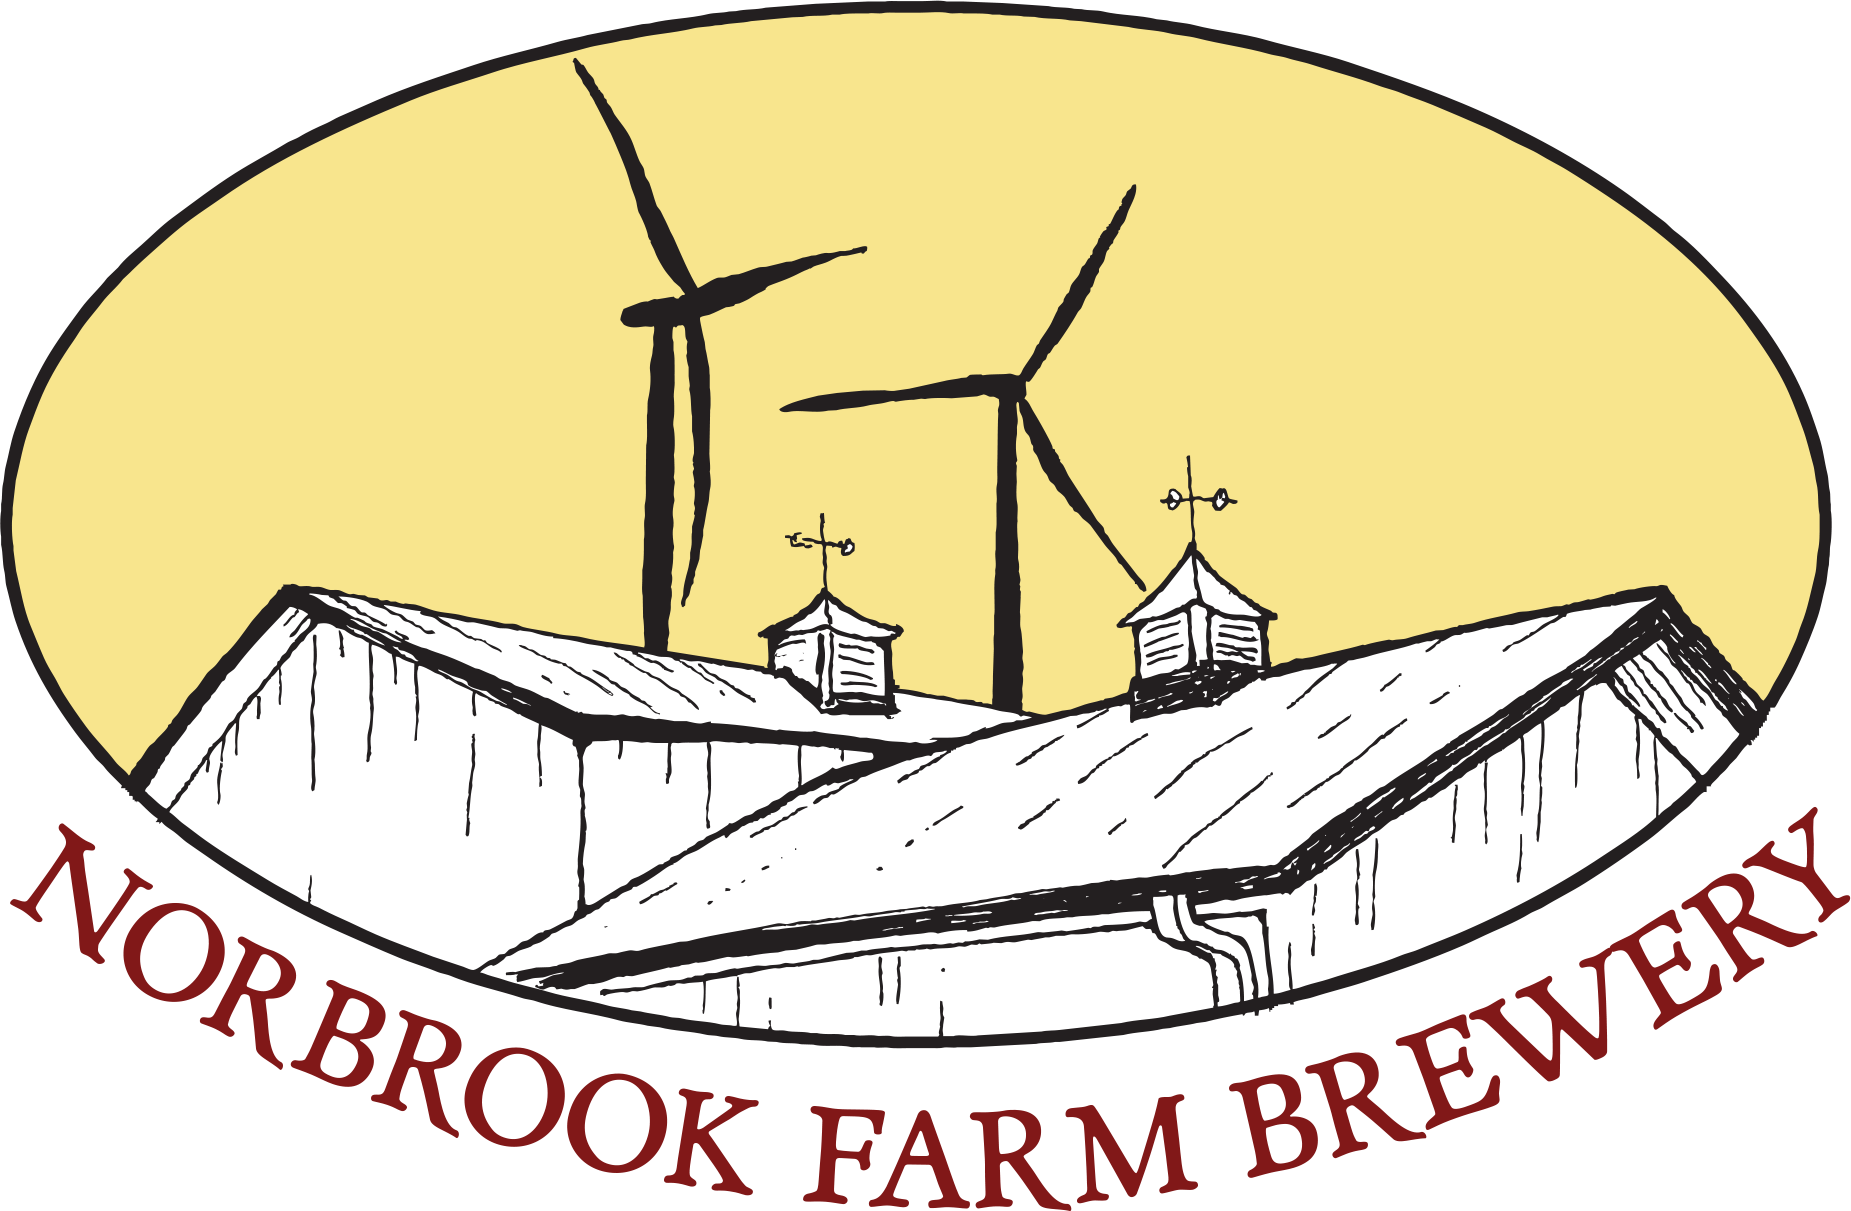 Norbrook Farm Brewery